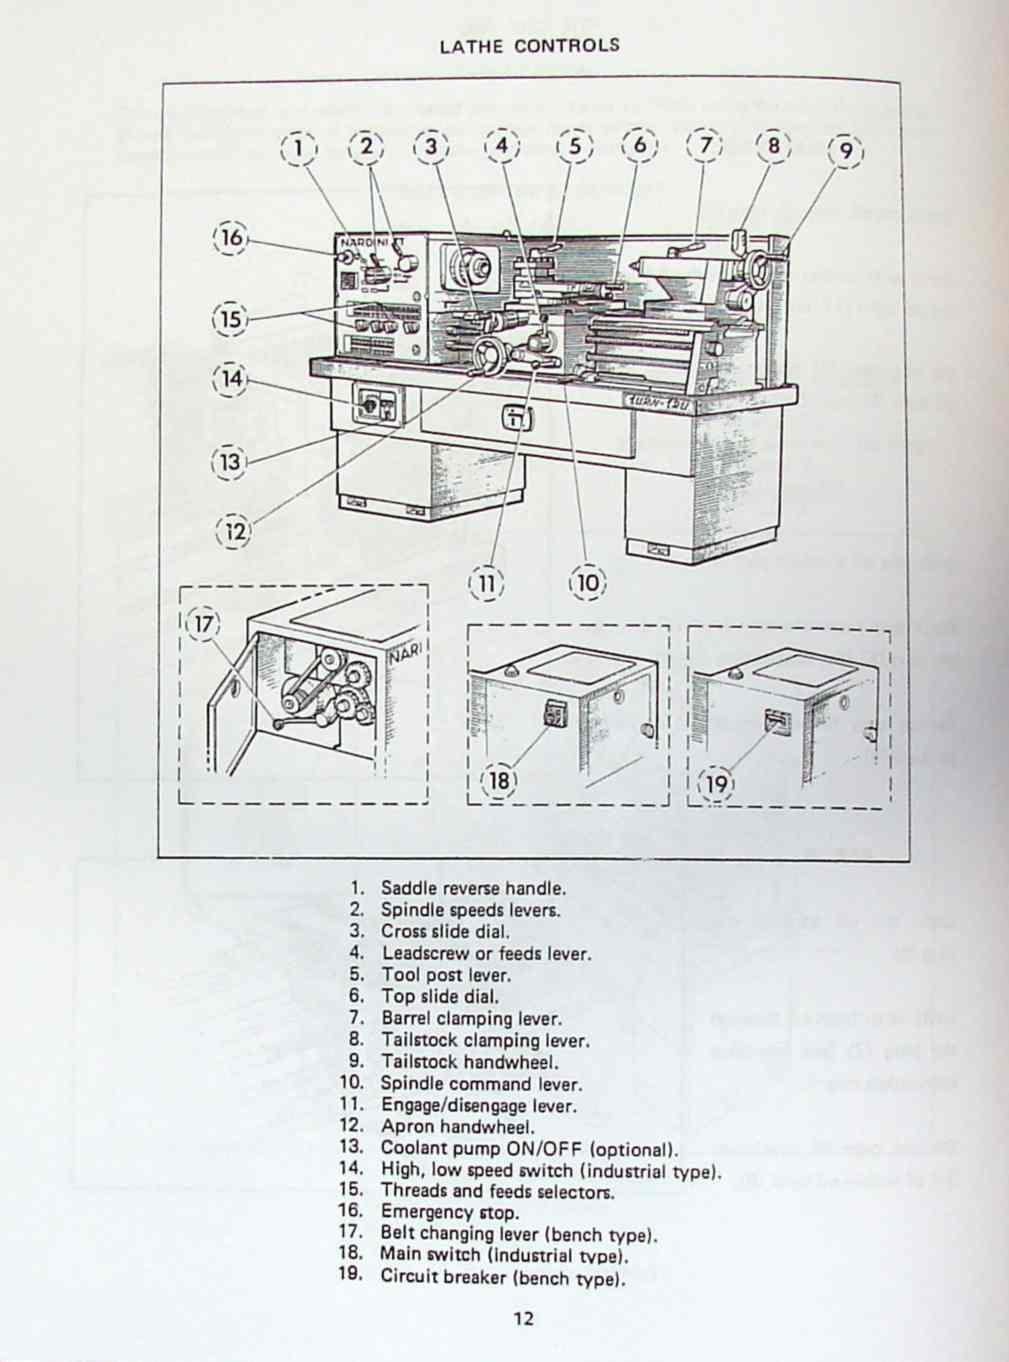 South Bend Lathe Parts Diagram Trusted Schematics Engine Nardini Wiring Wire Center U2022 9